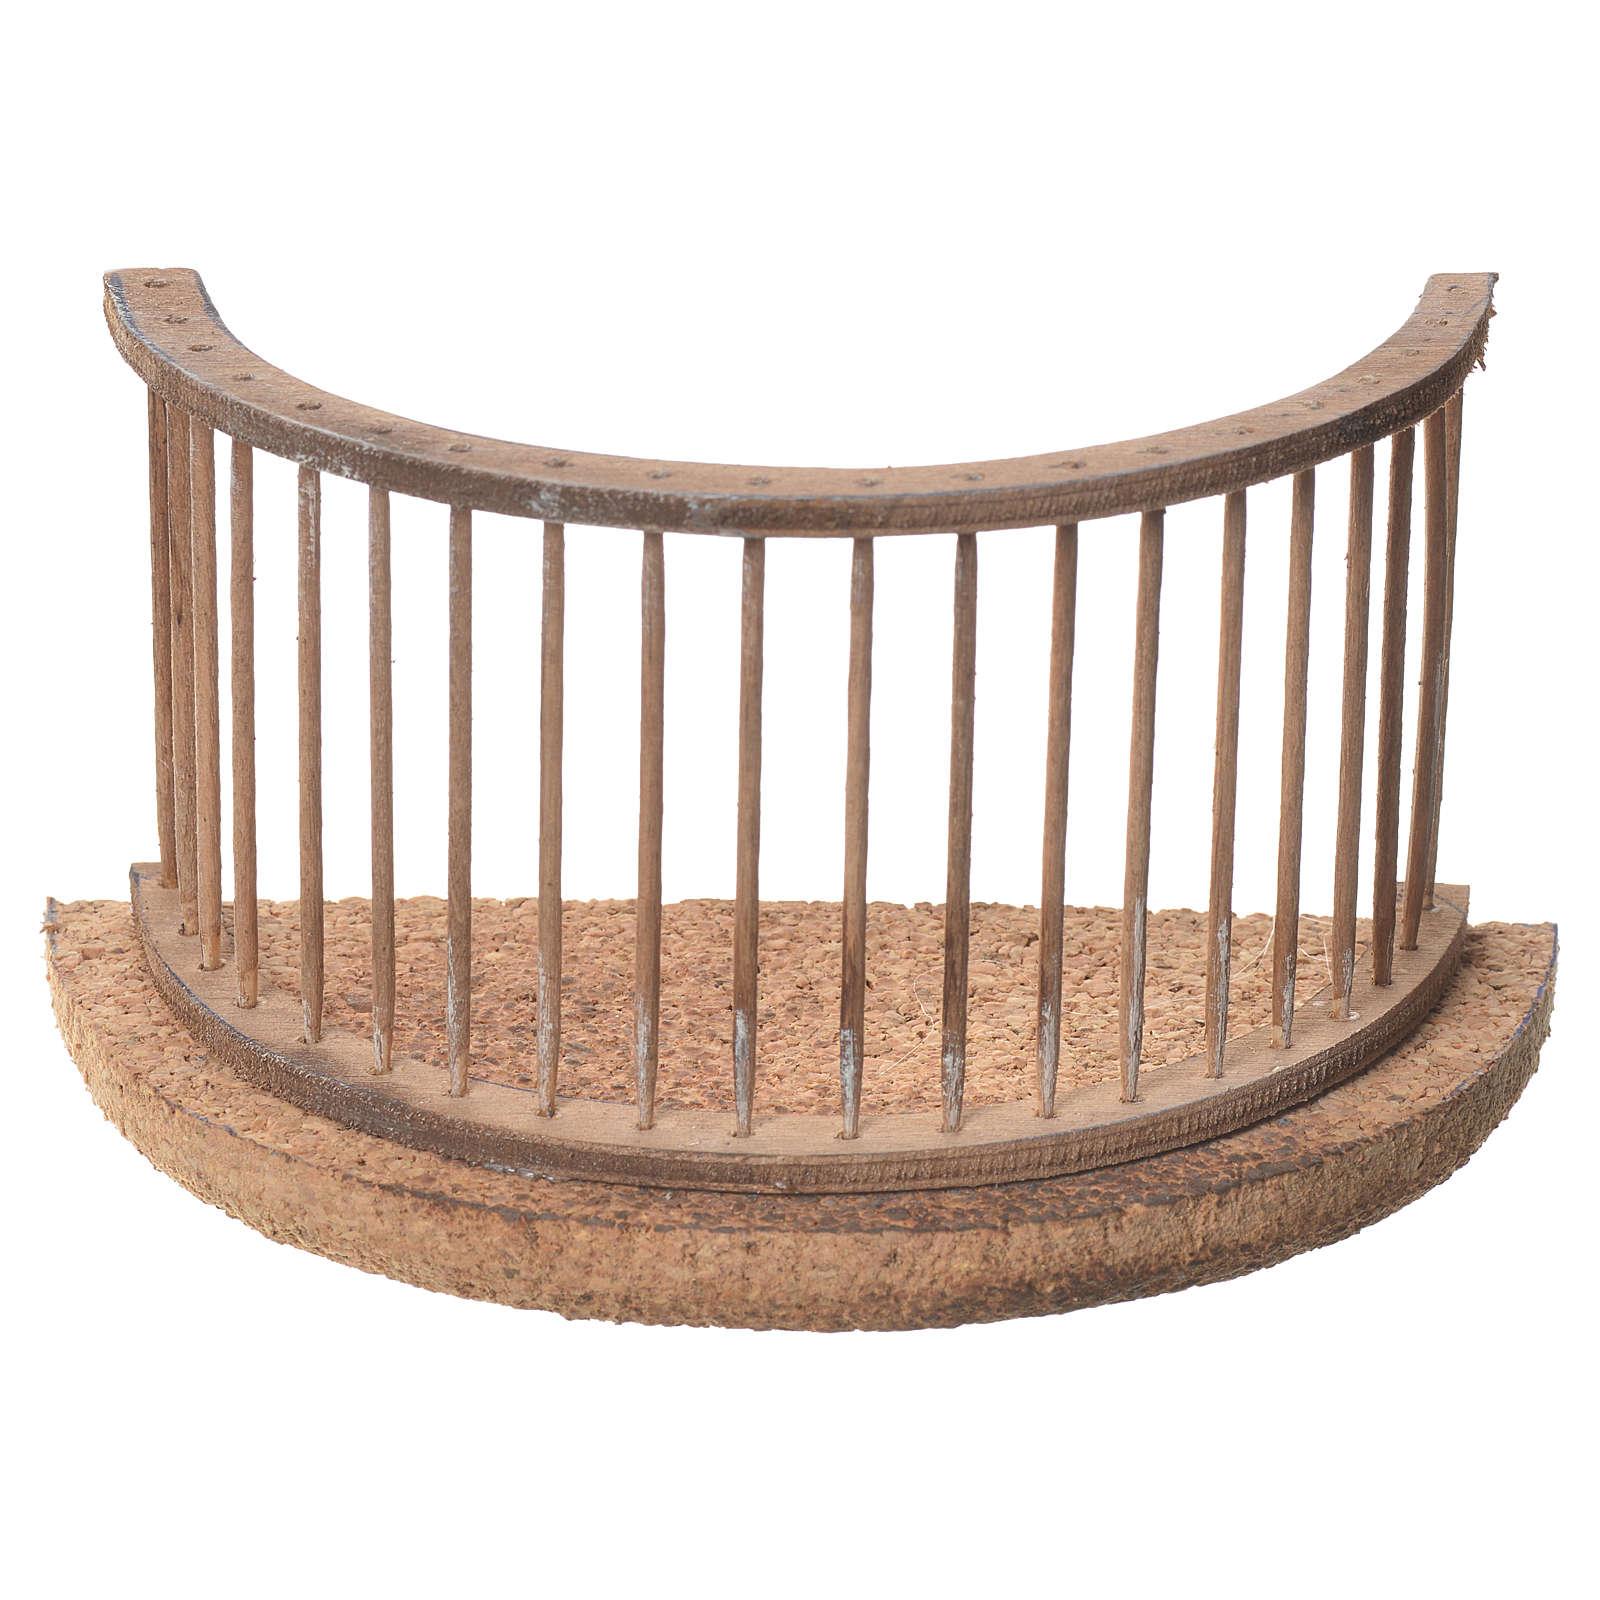 Balcon crèche napolitaine 13x8 cm 4